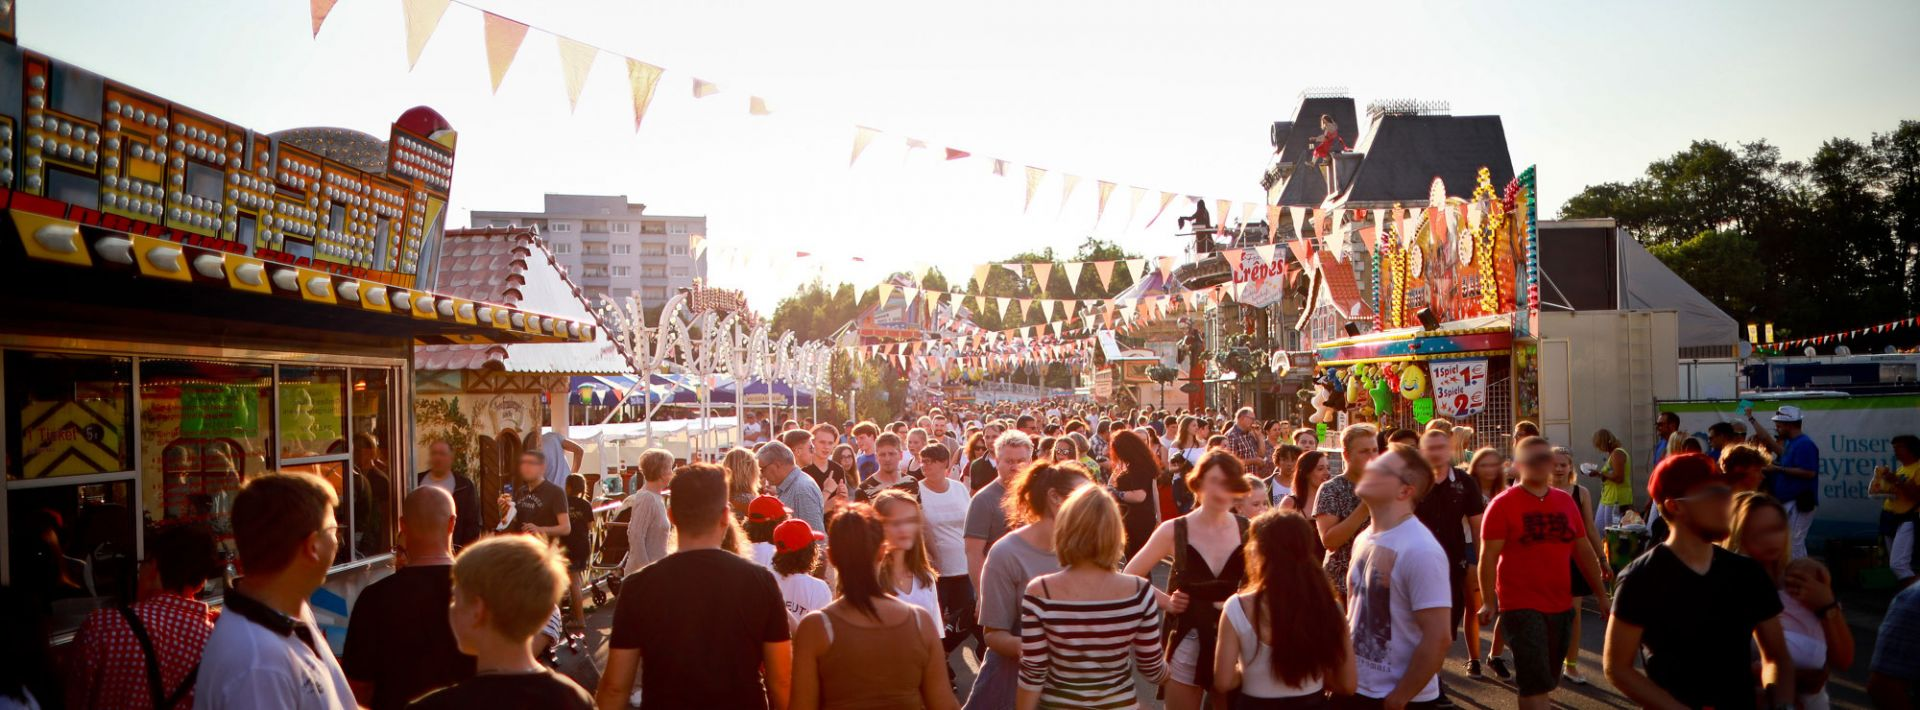 Volksfest hof 2020 fahrgeschäfte